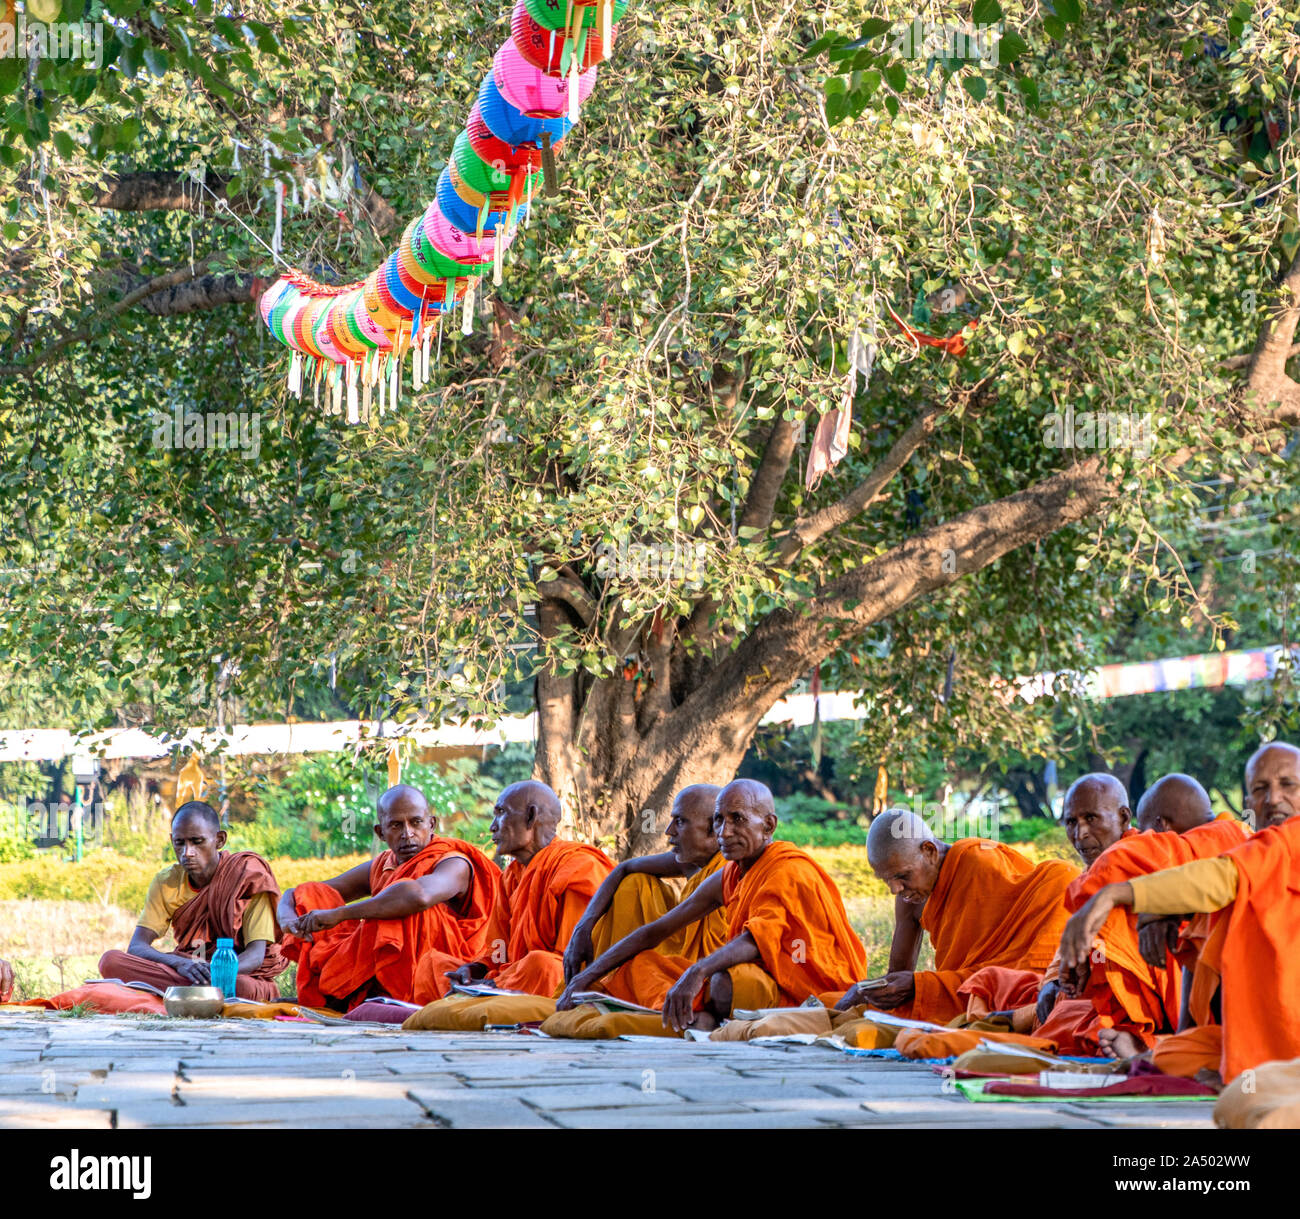 Senior Buddhist monks sitting infront of Maya Devi Temple at Lumbini, Nepal Stock Photo